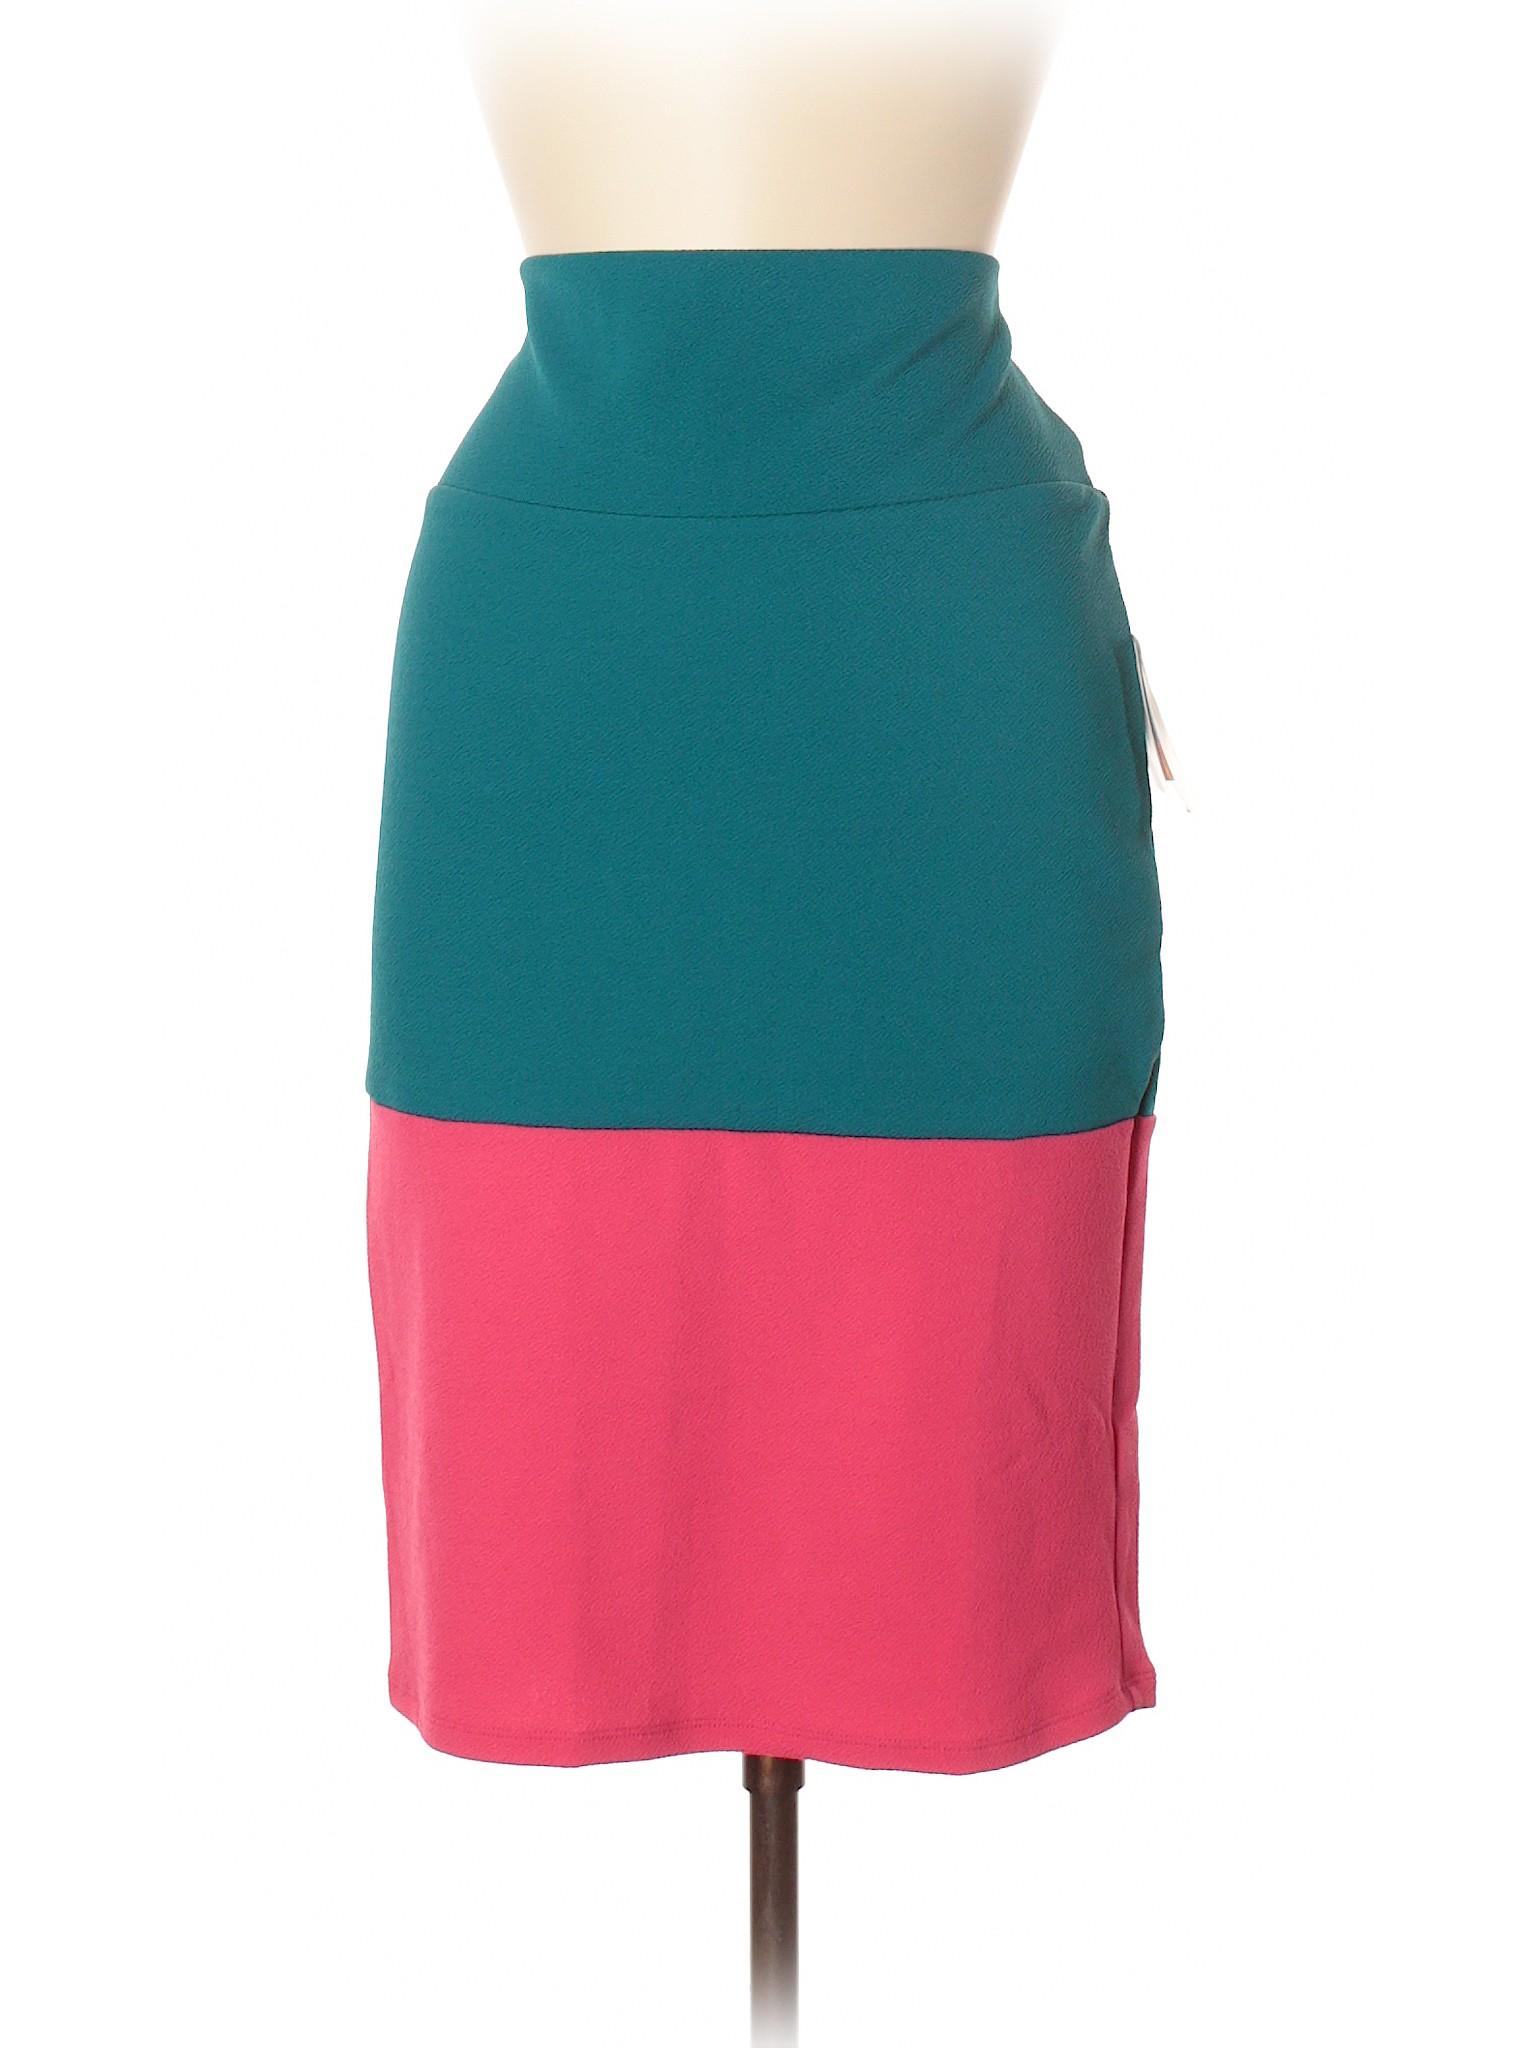 Boutique Lularoe Casual Skirt Boutique Lularoe Casual Boutique Skirt Rx7ZwRrUq